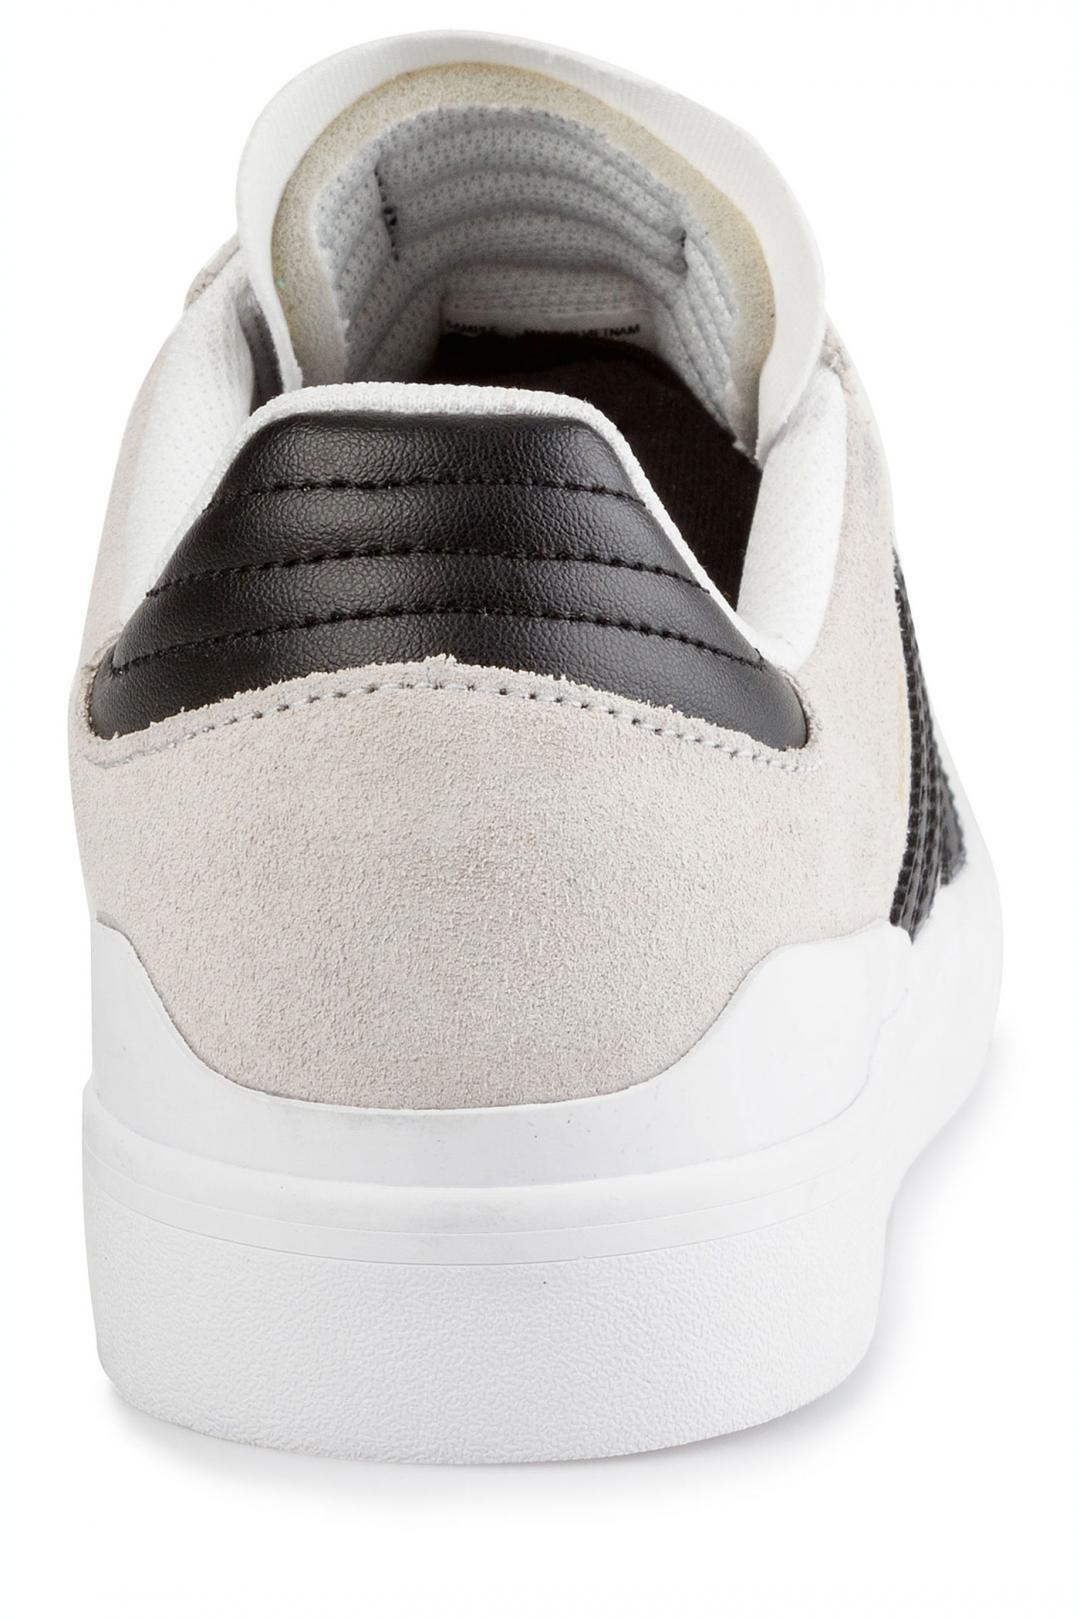 Uomo adidas Skateboarding Busenitz Vulc crystal white core black white | Sneakers low top